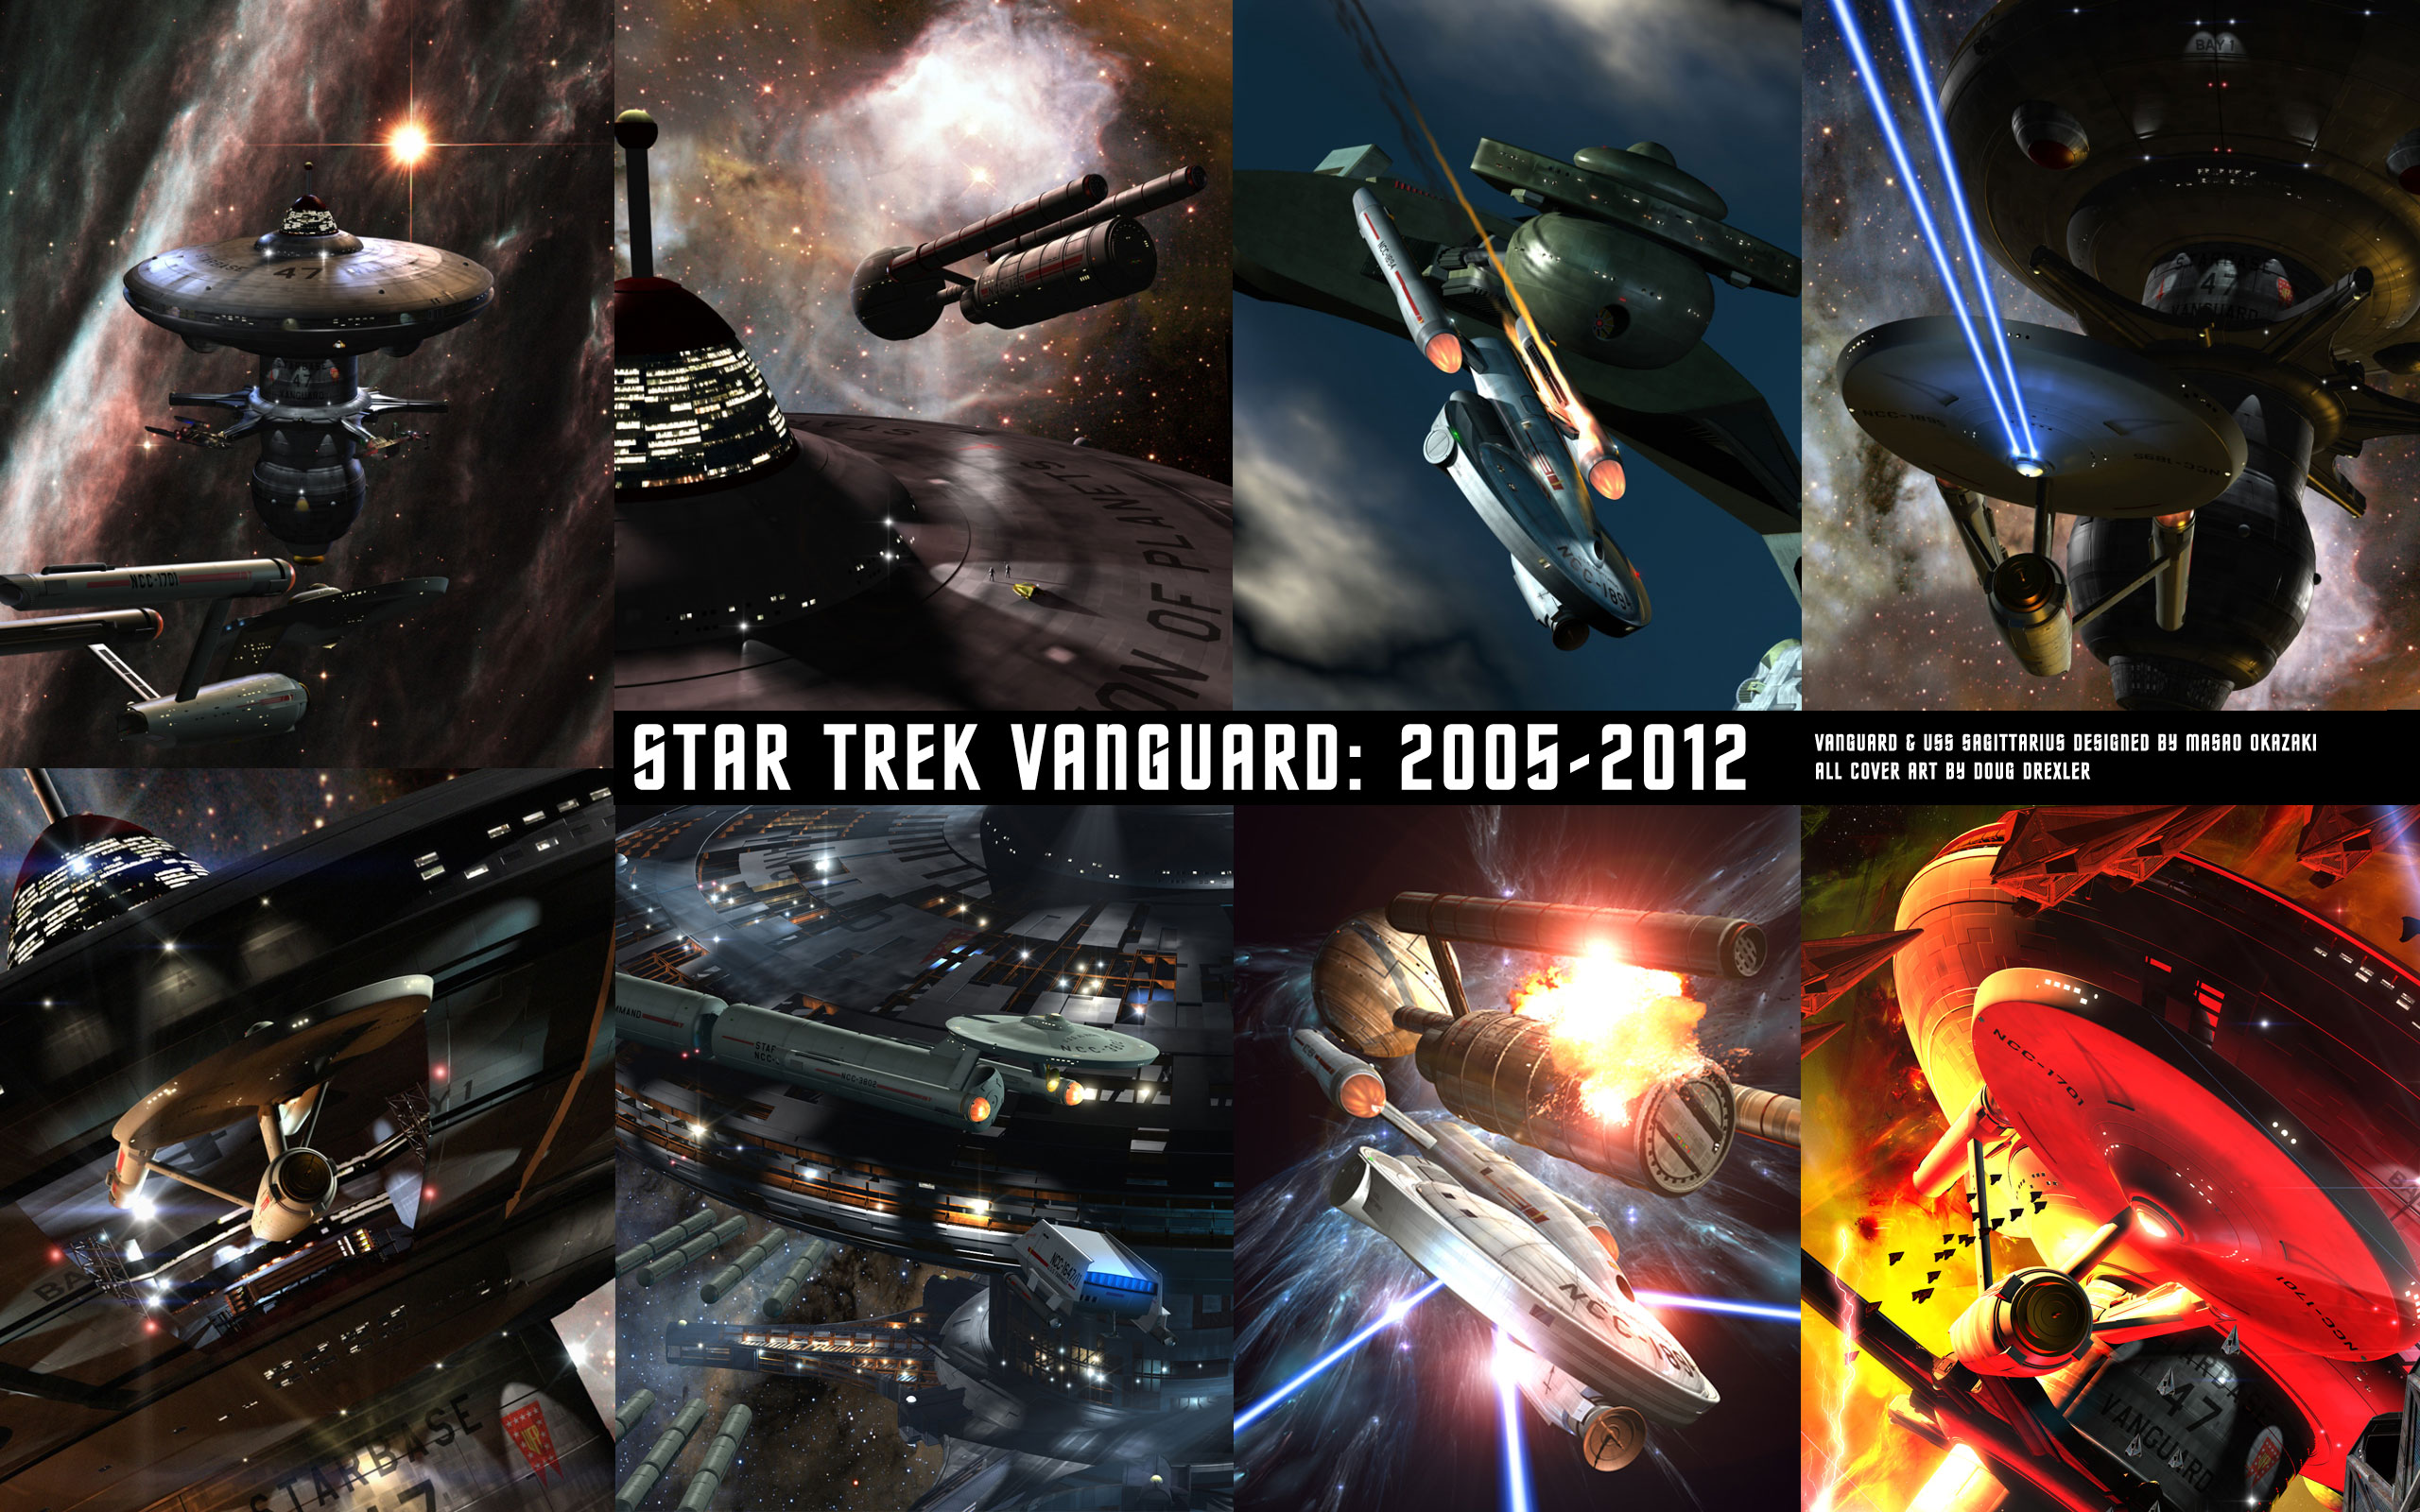 A Wallpaper Image of the Star Trek Vanguard cover art.